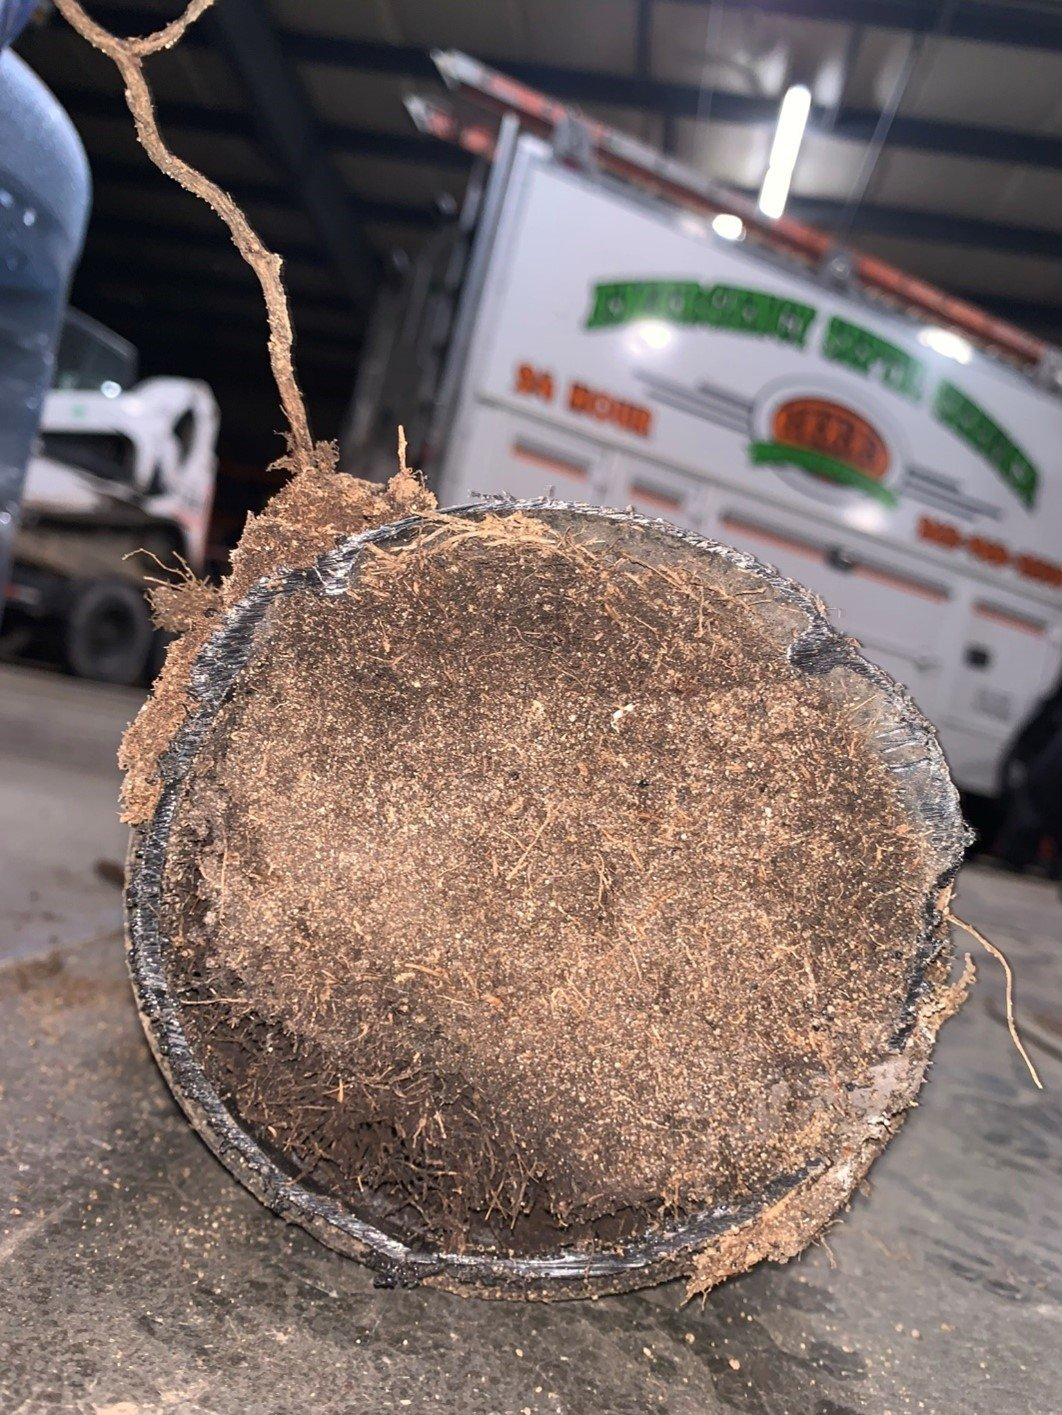 Repairing Sewer because of Root Mass